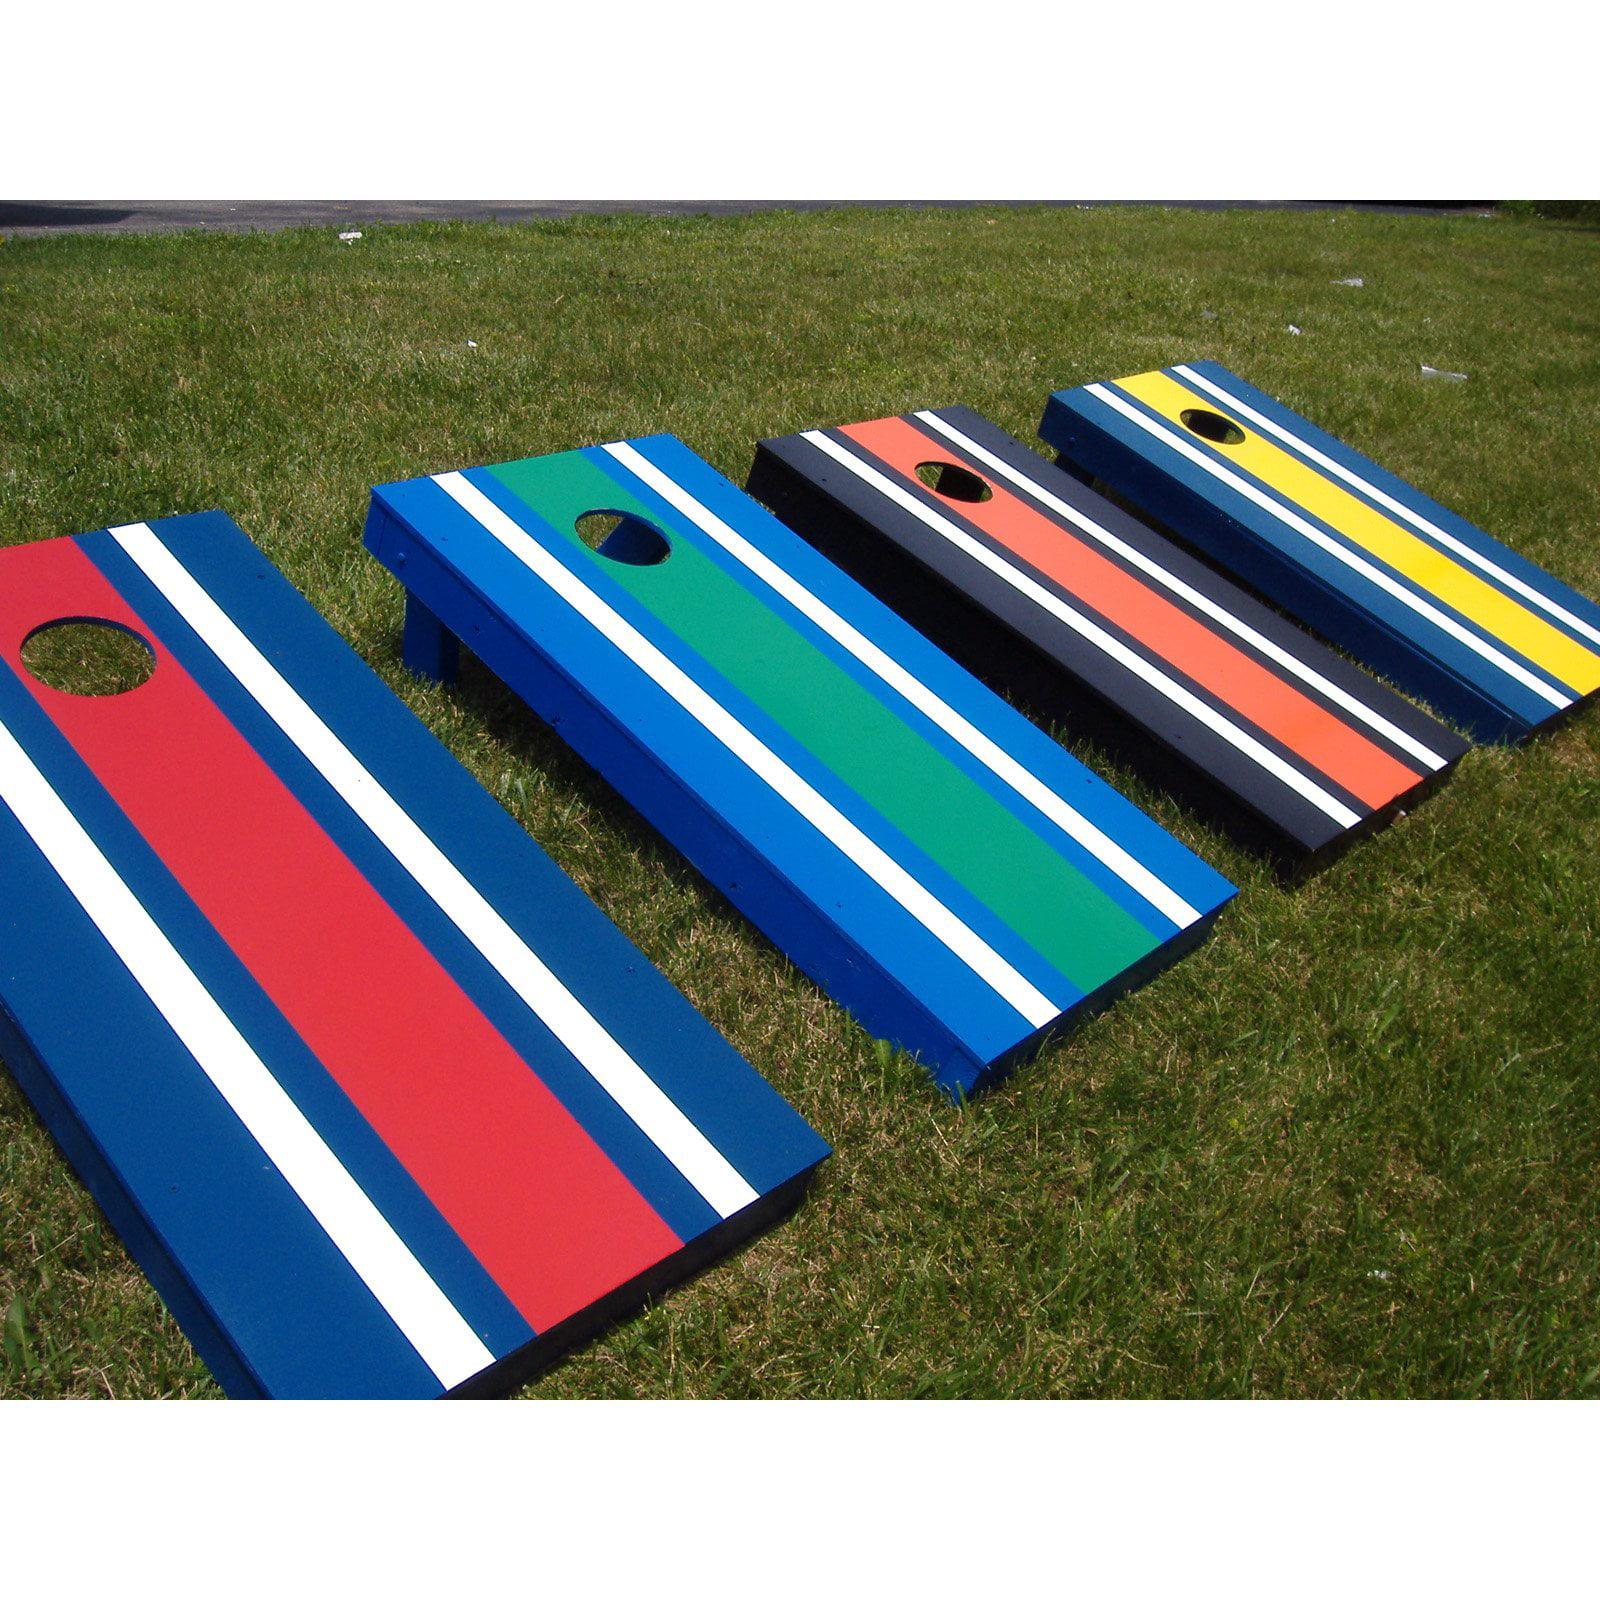 Striped Tournament Cornhole Set by AJJ Cornhole